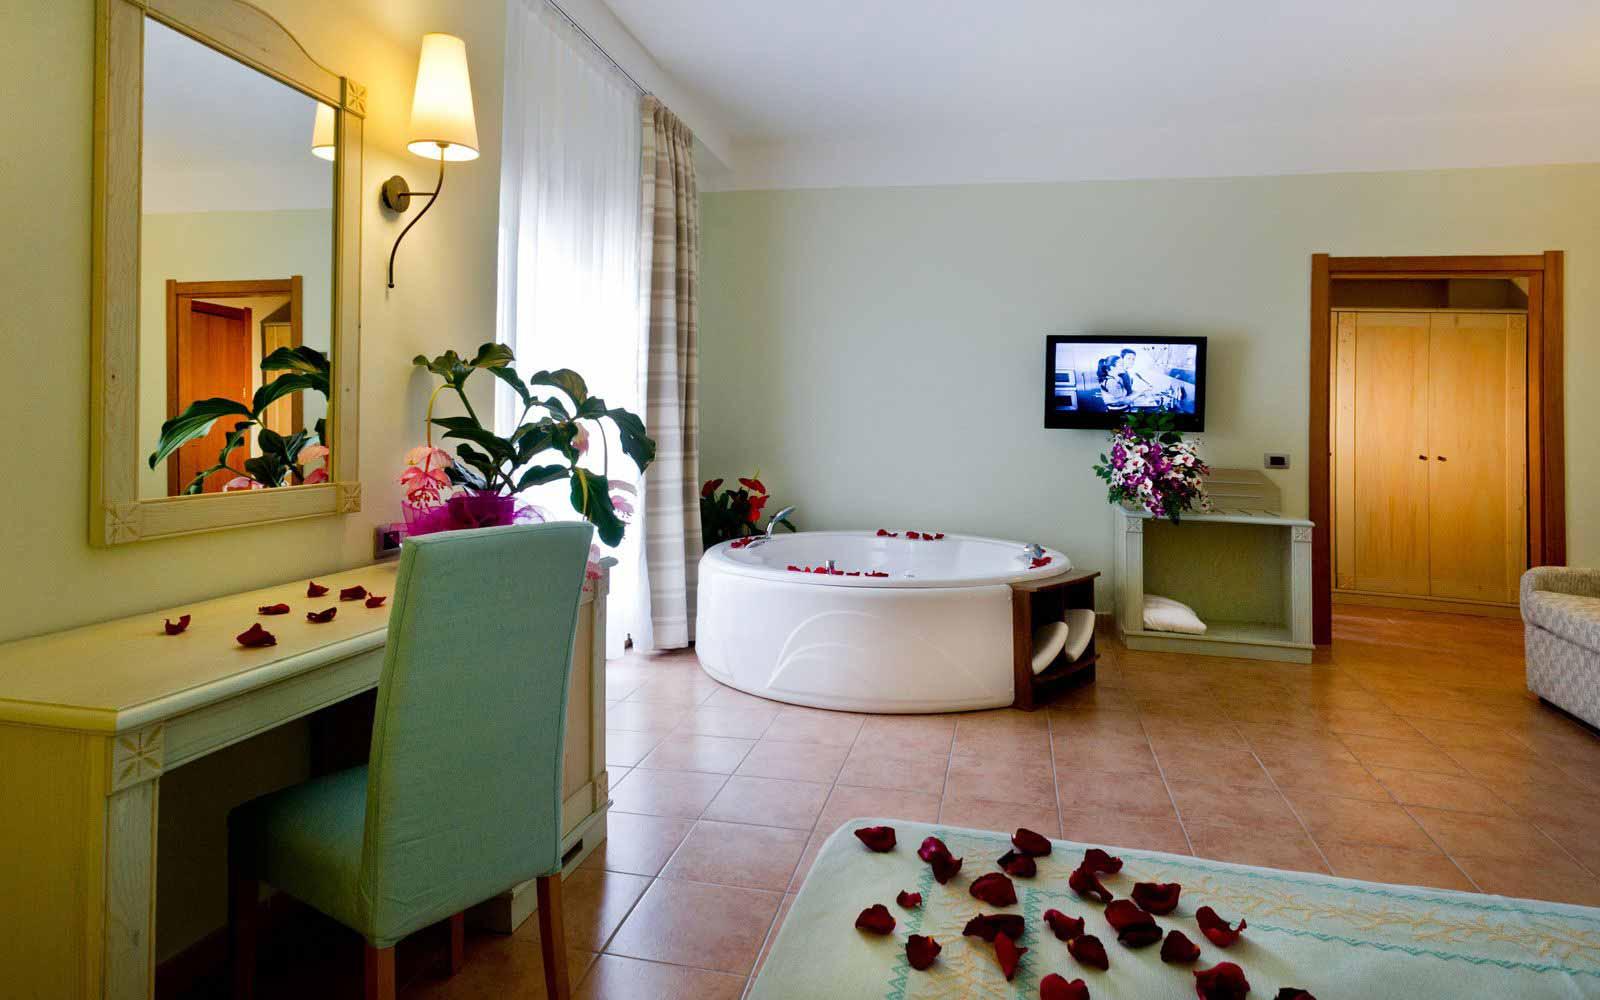 Grand Deluxe room at Hotel Brancamaria